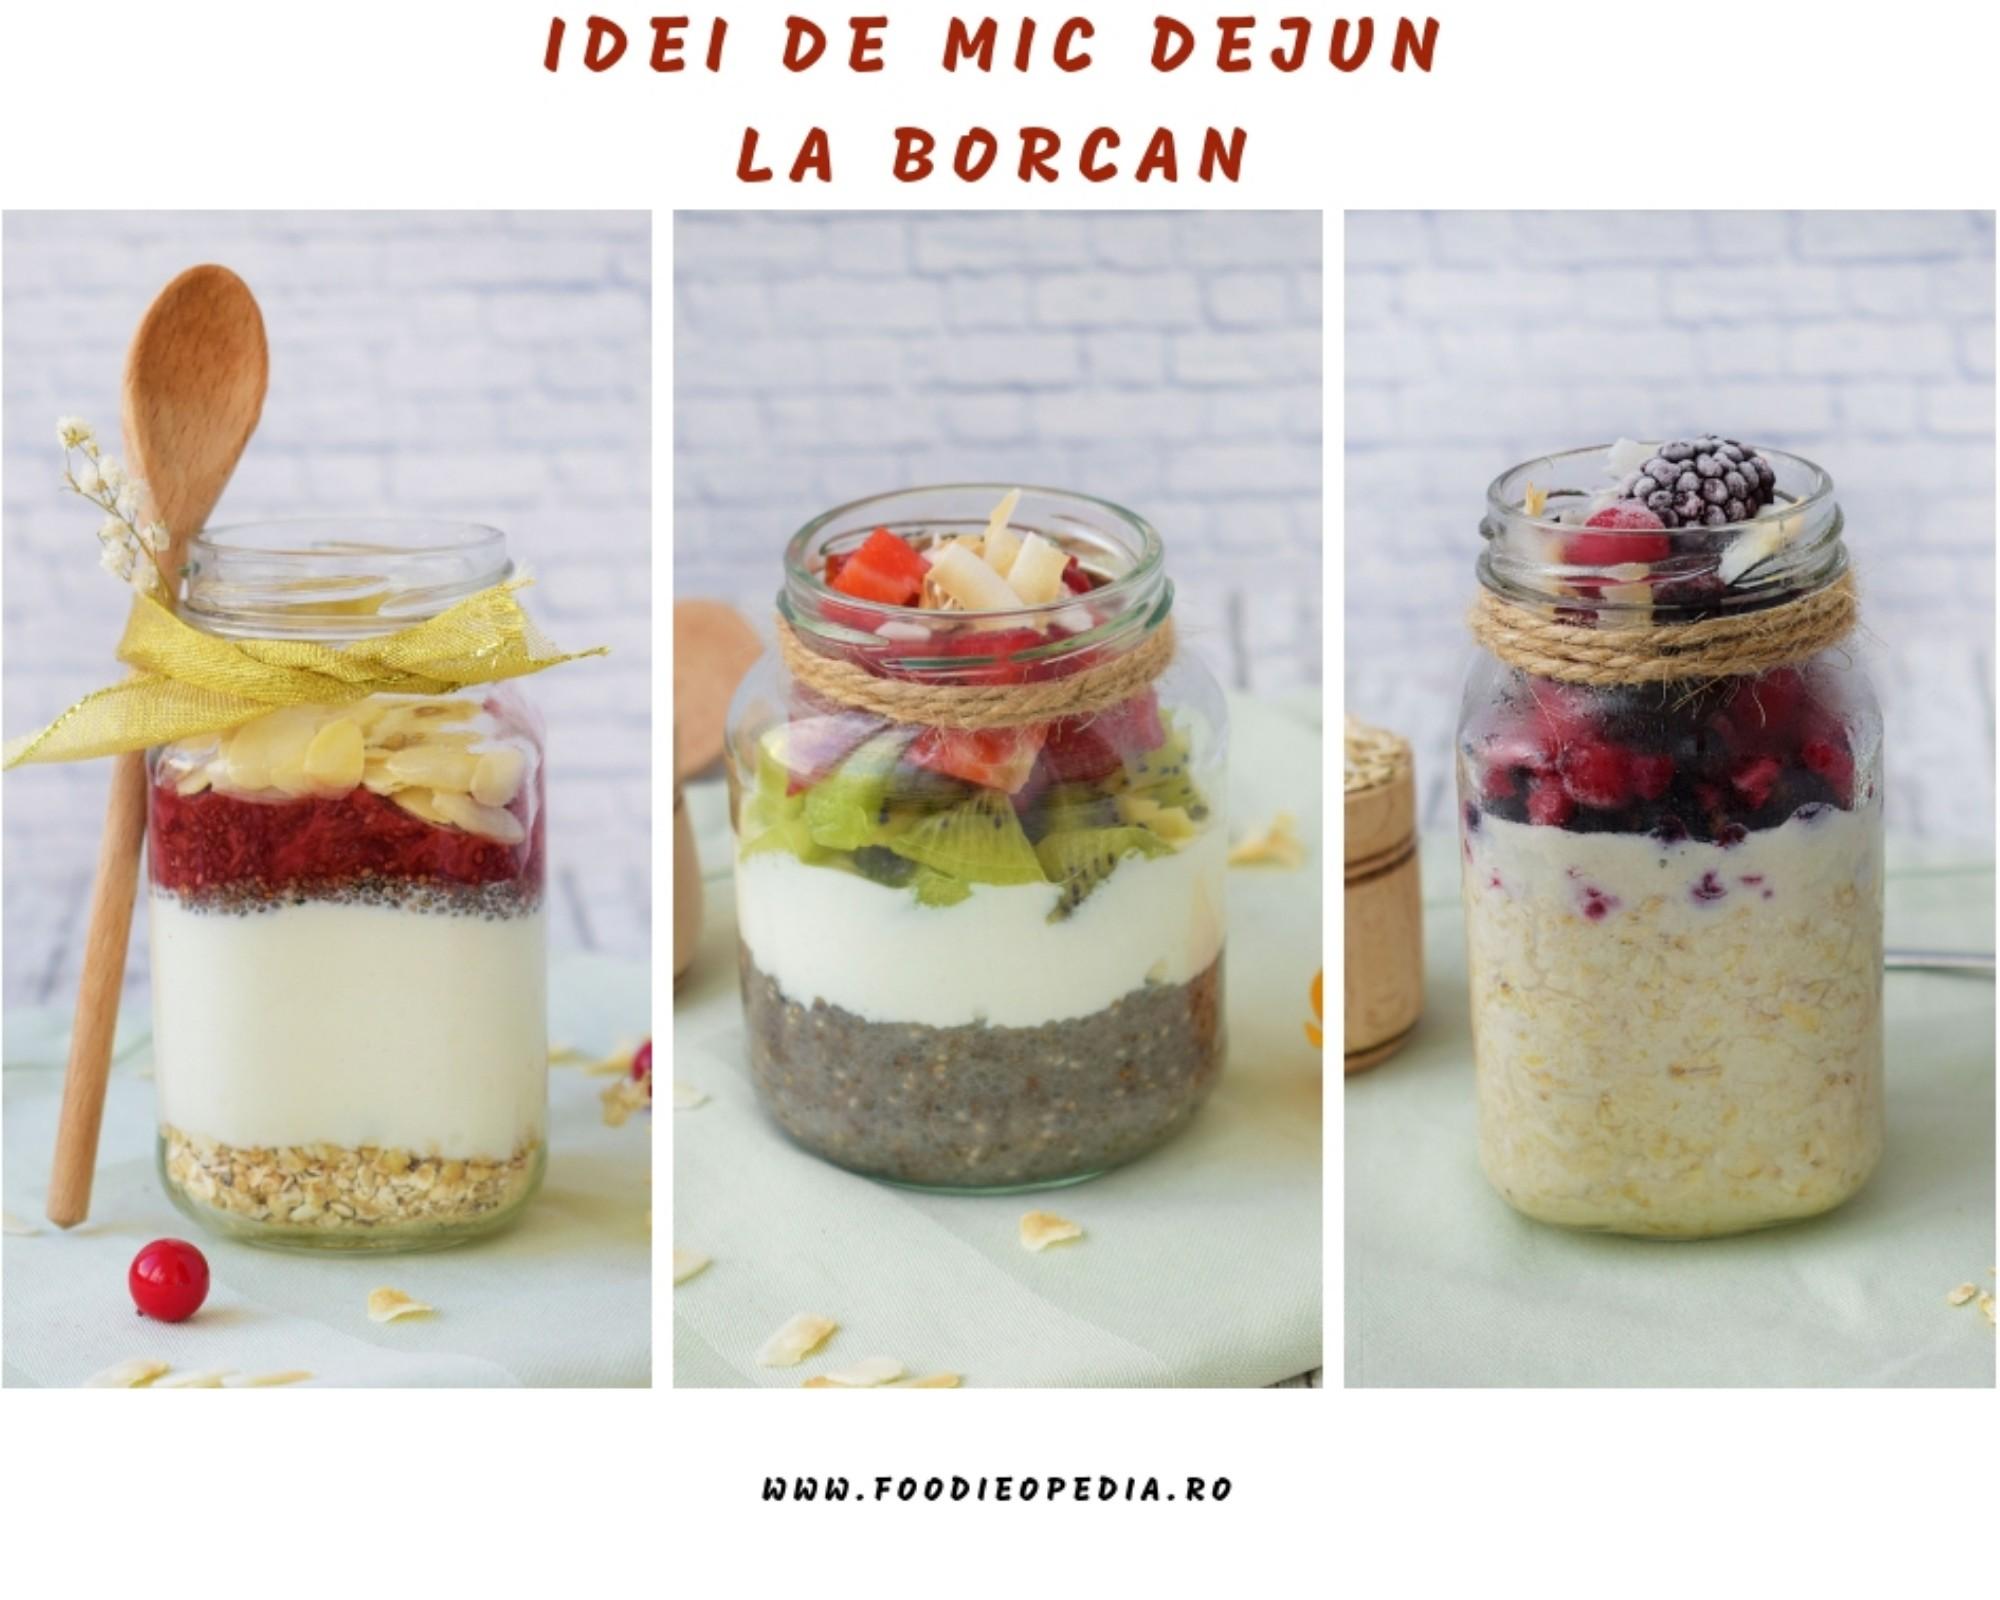 idei de mic dejun la borcan - foodieopedia.ro